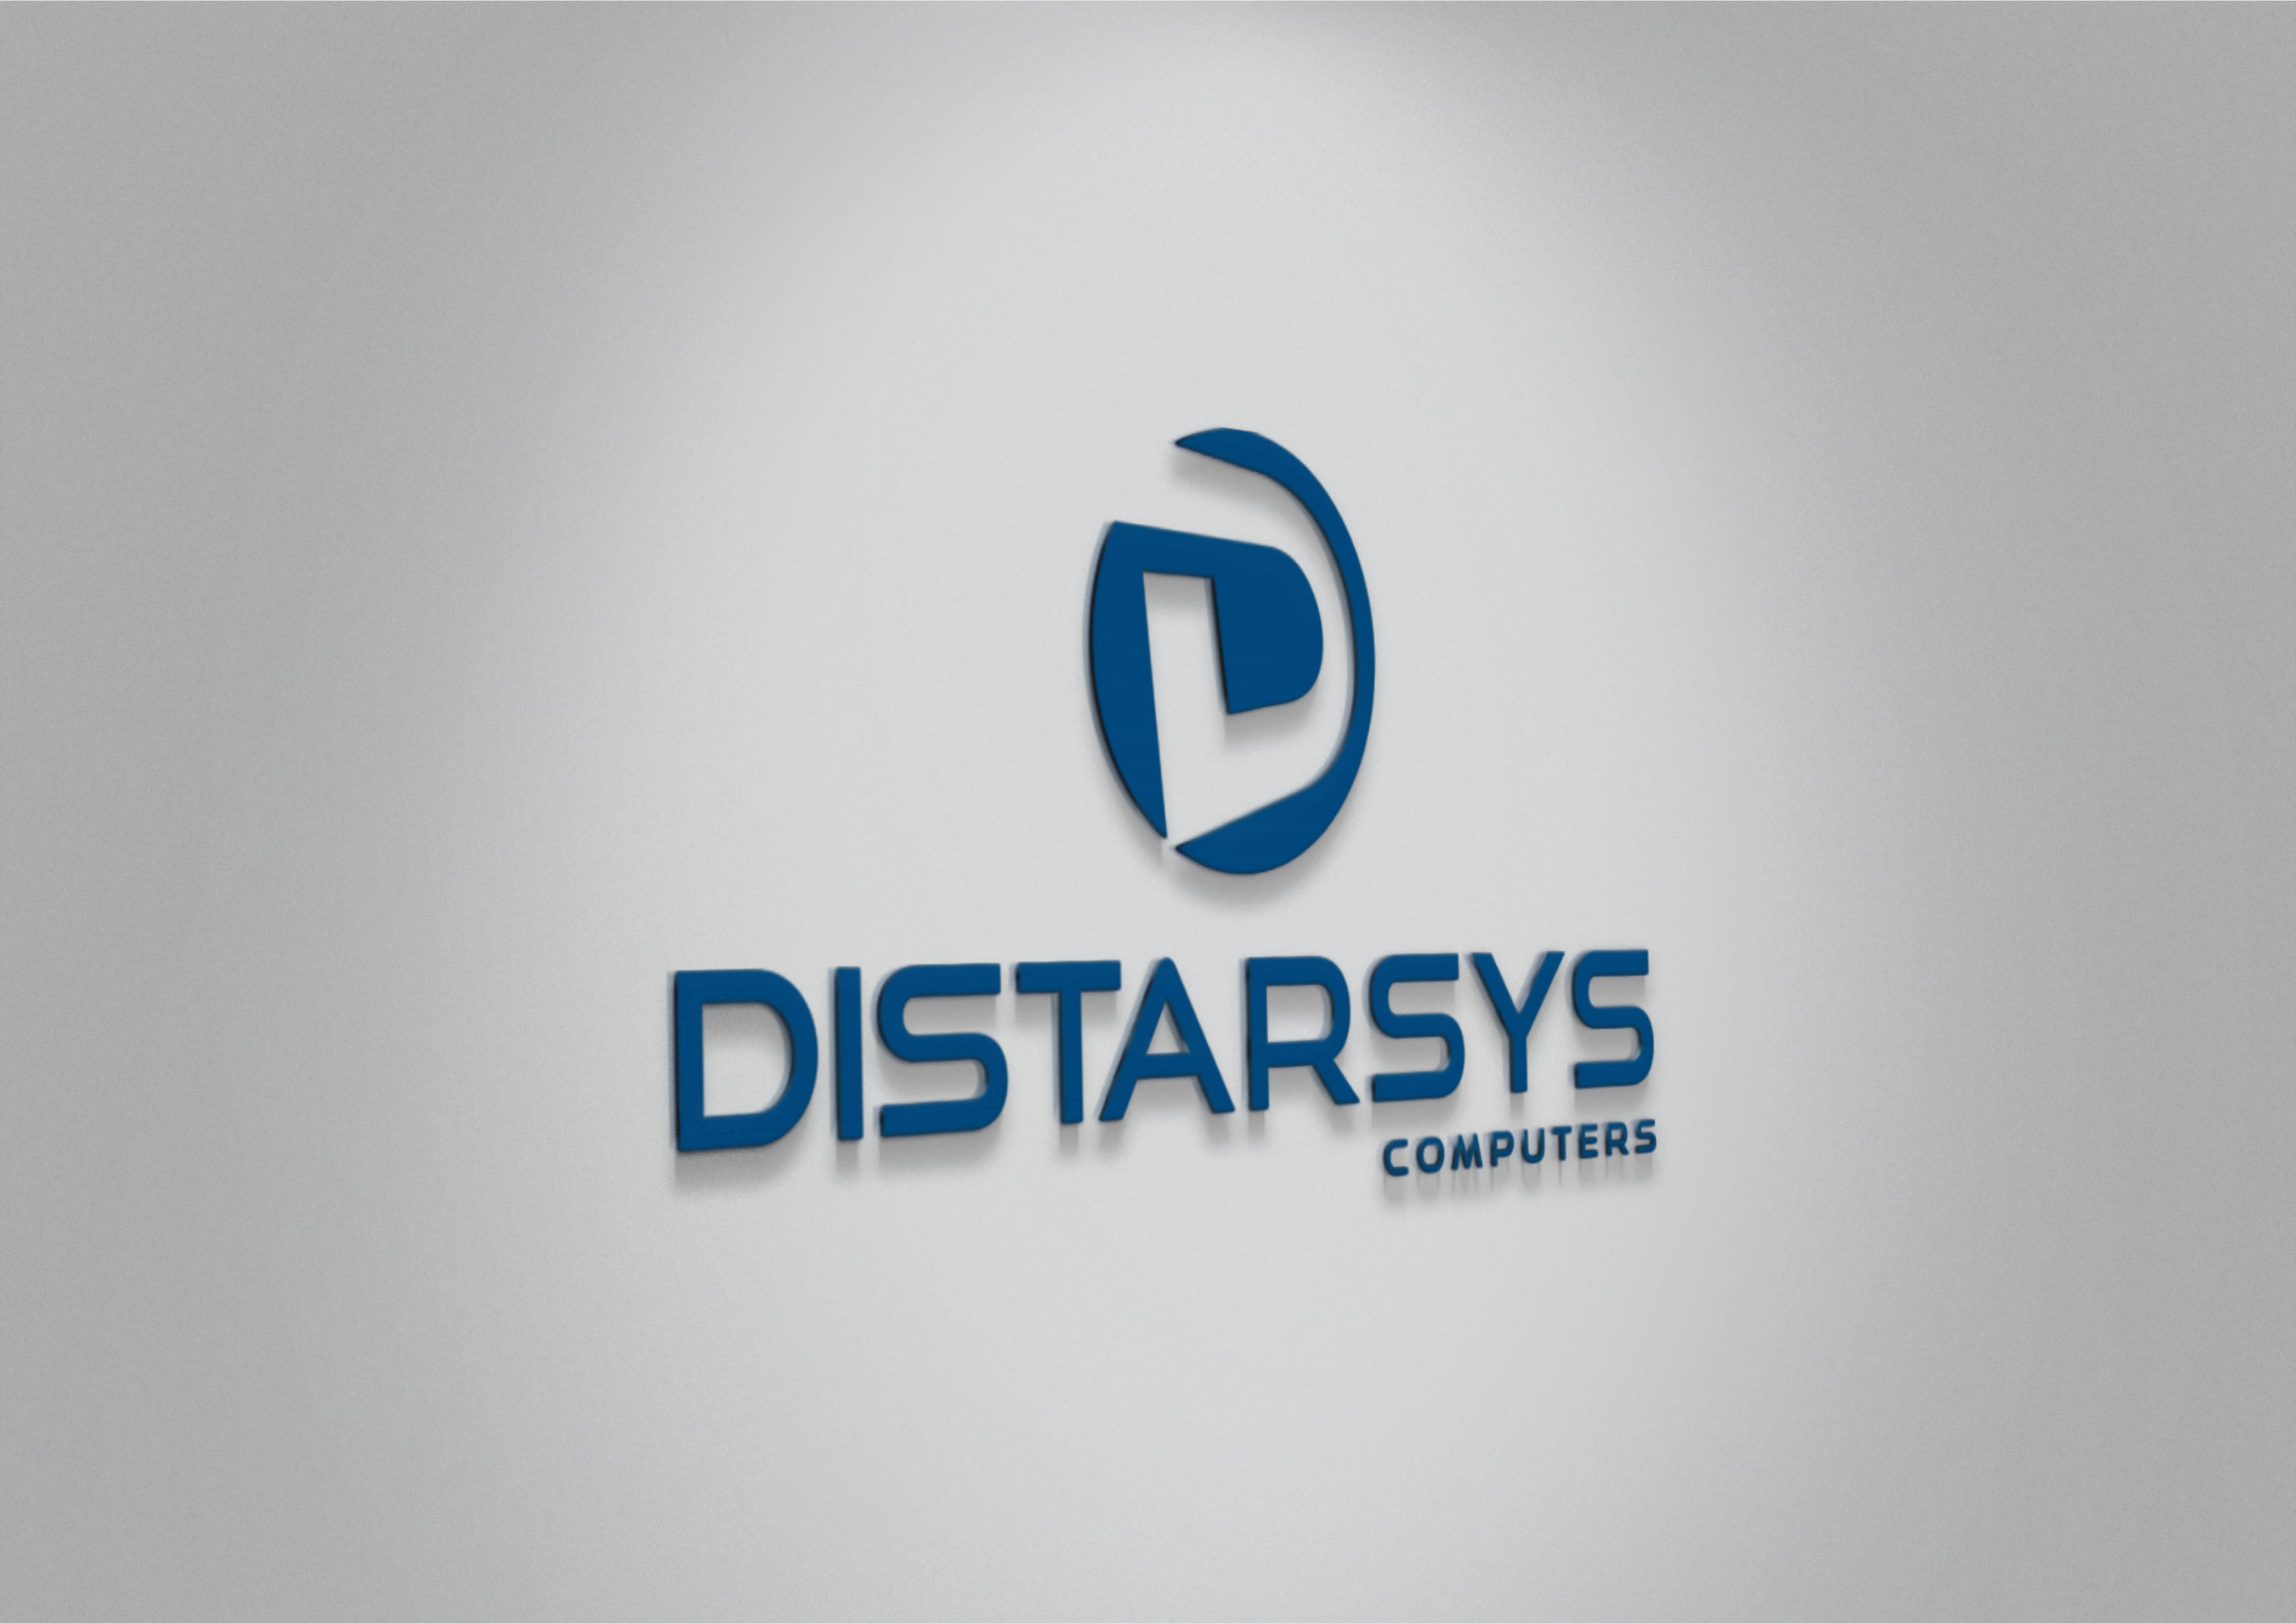 Нейминг, логотип и фирменный стиль DISTARSYS